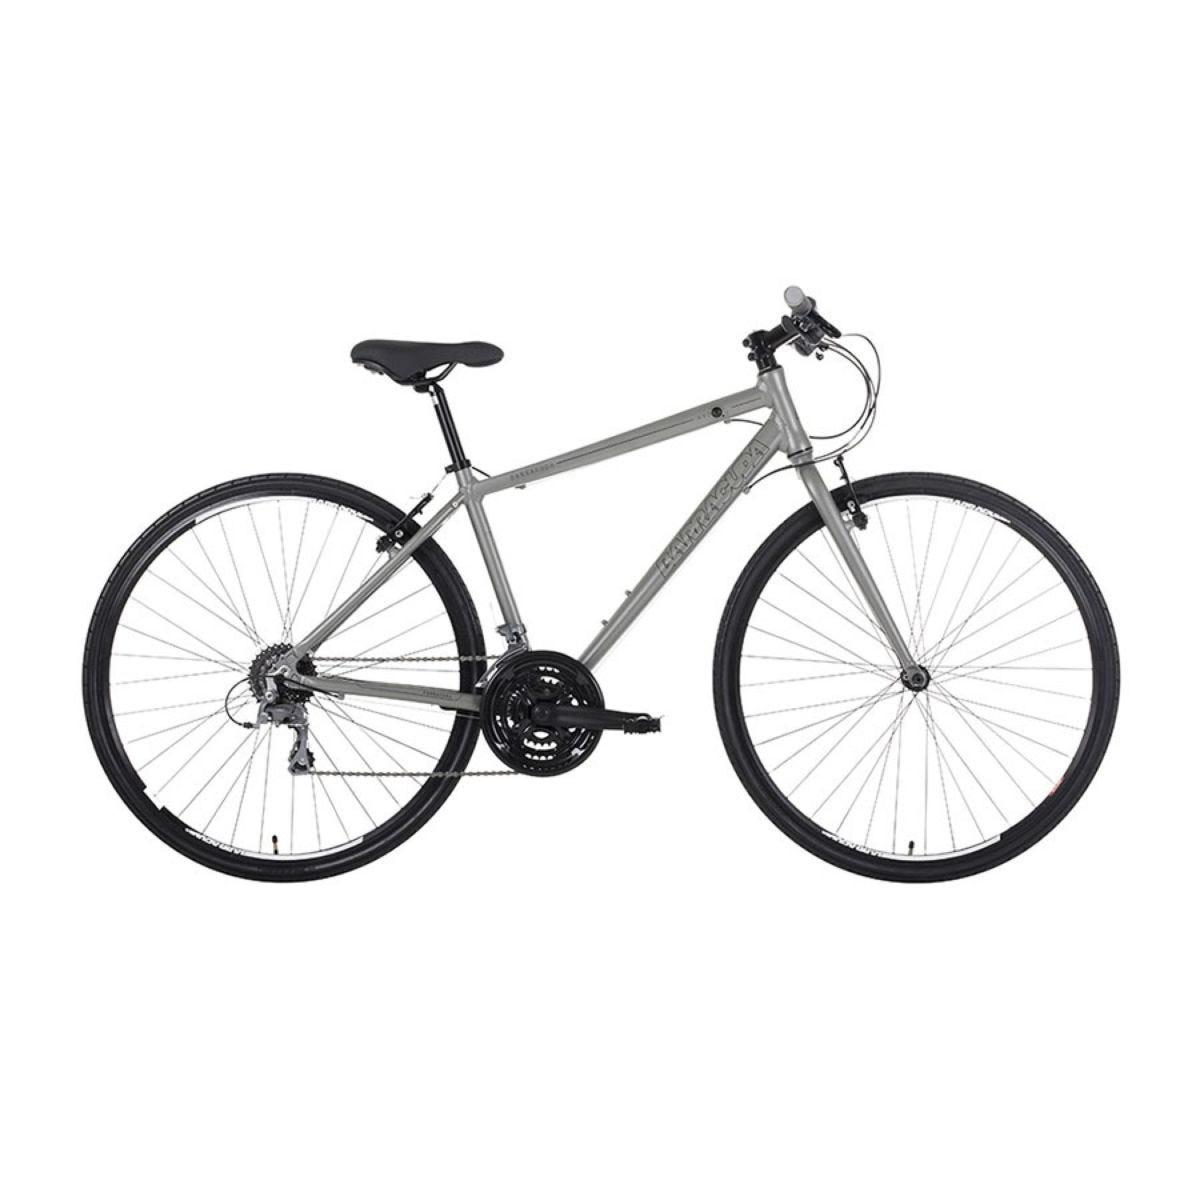 Barracuda Men's Hydra 2 Sports Hybrid Bike 700c Wheel Bike